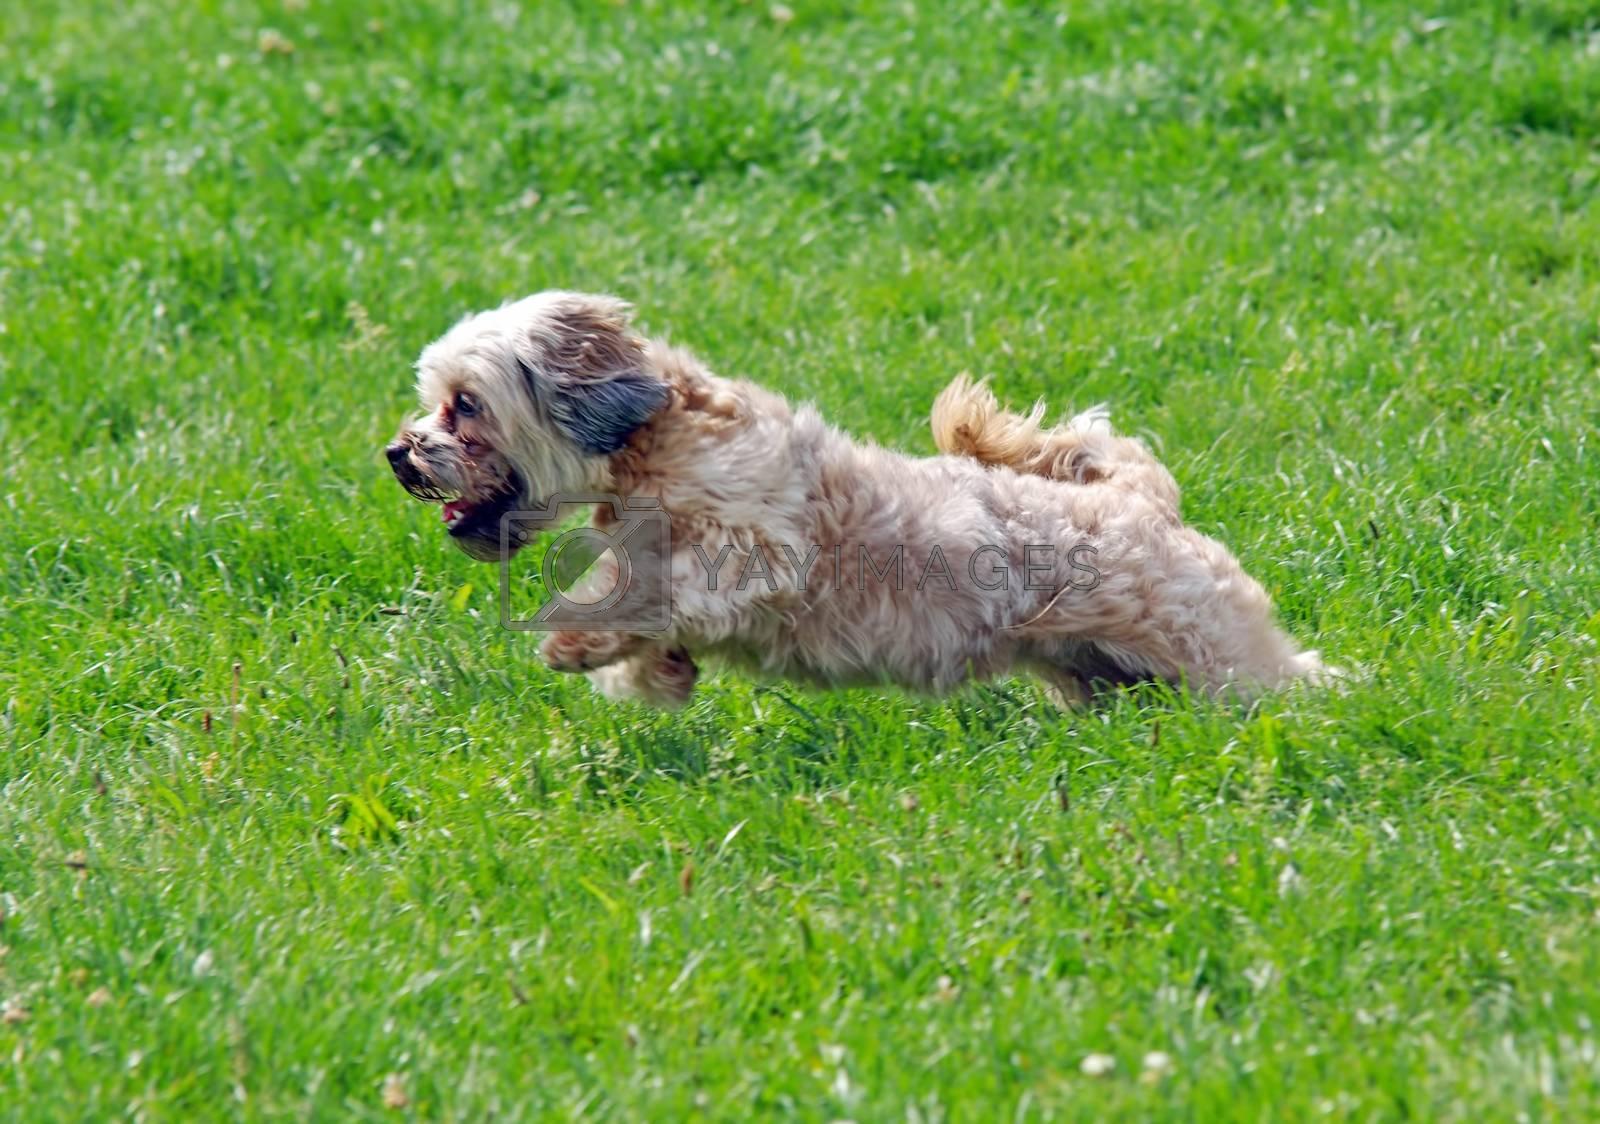 Lovely bichon dog running on the grass.